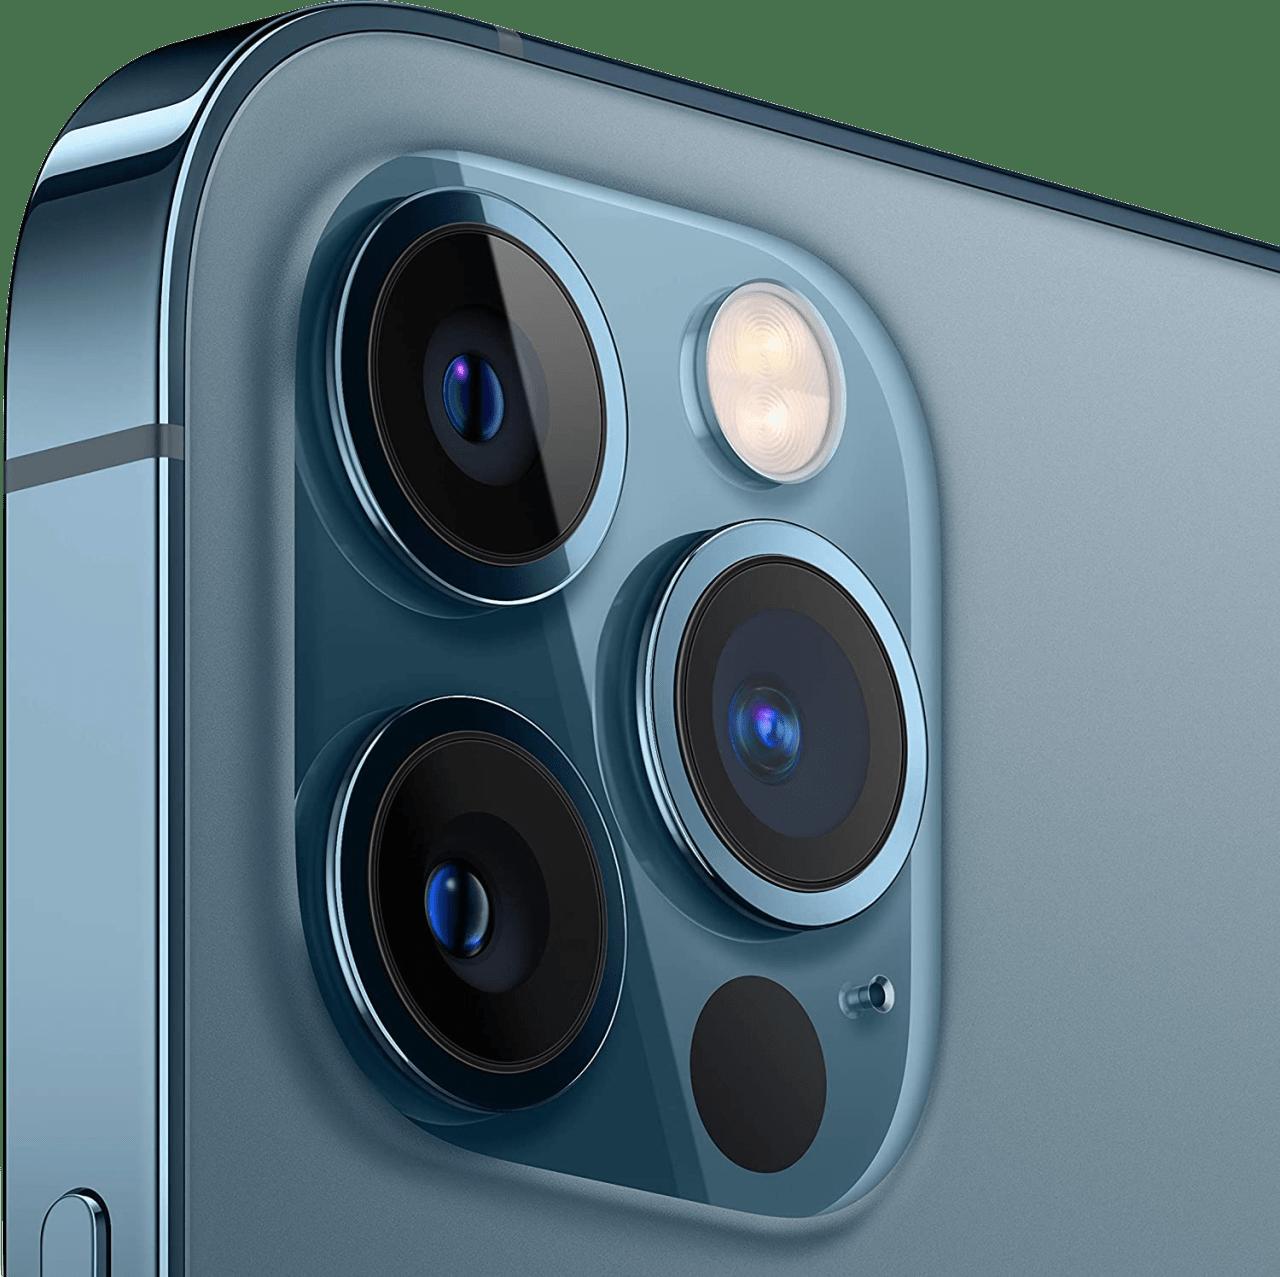 Blau Apple iPhone 12 Pro 128GB.2